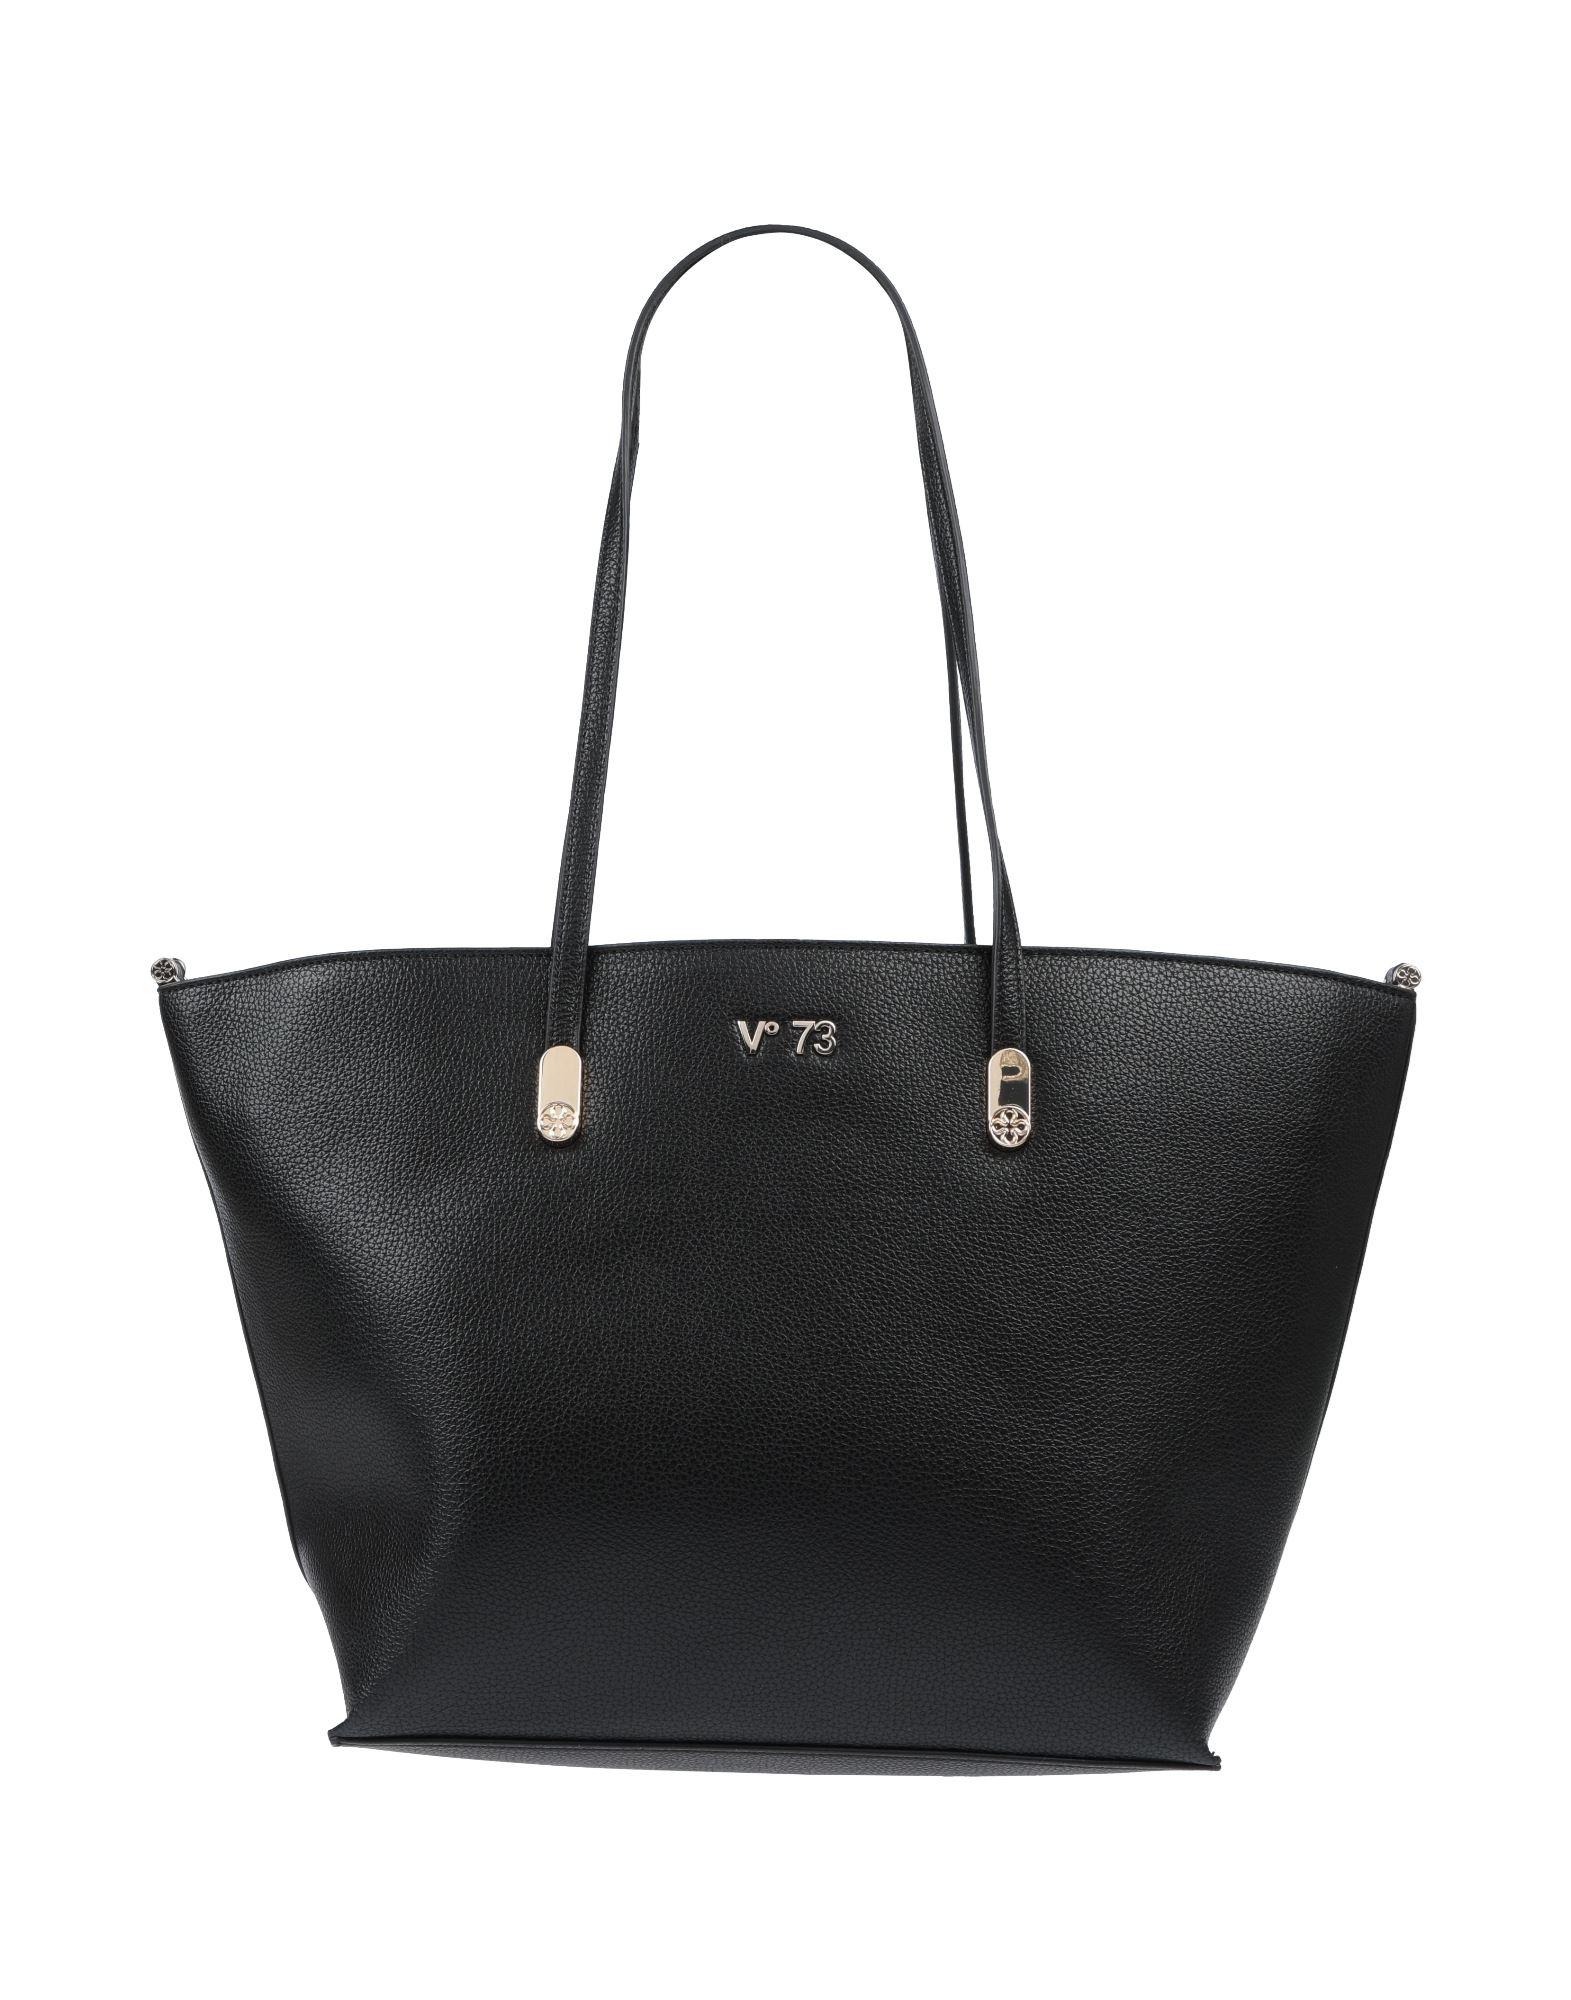 Vdegree73 Shoulder bags - Item 45555895